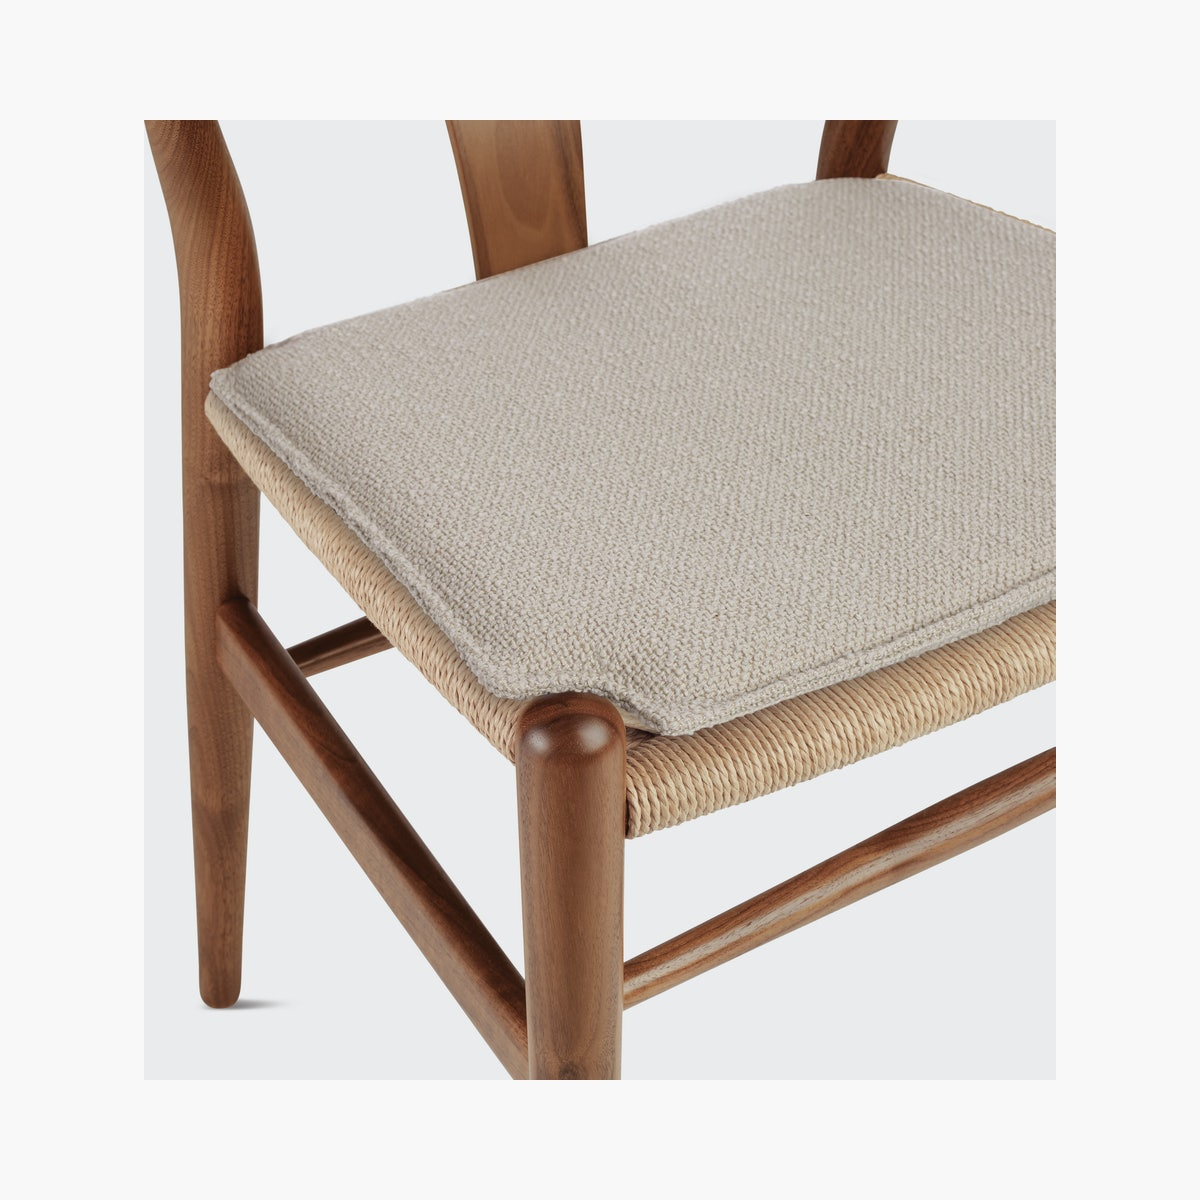 Wishbone Chair Seat Cushion